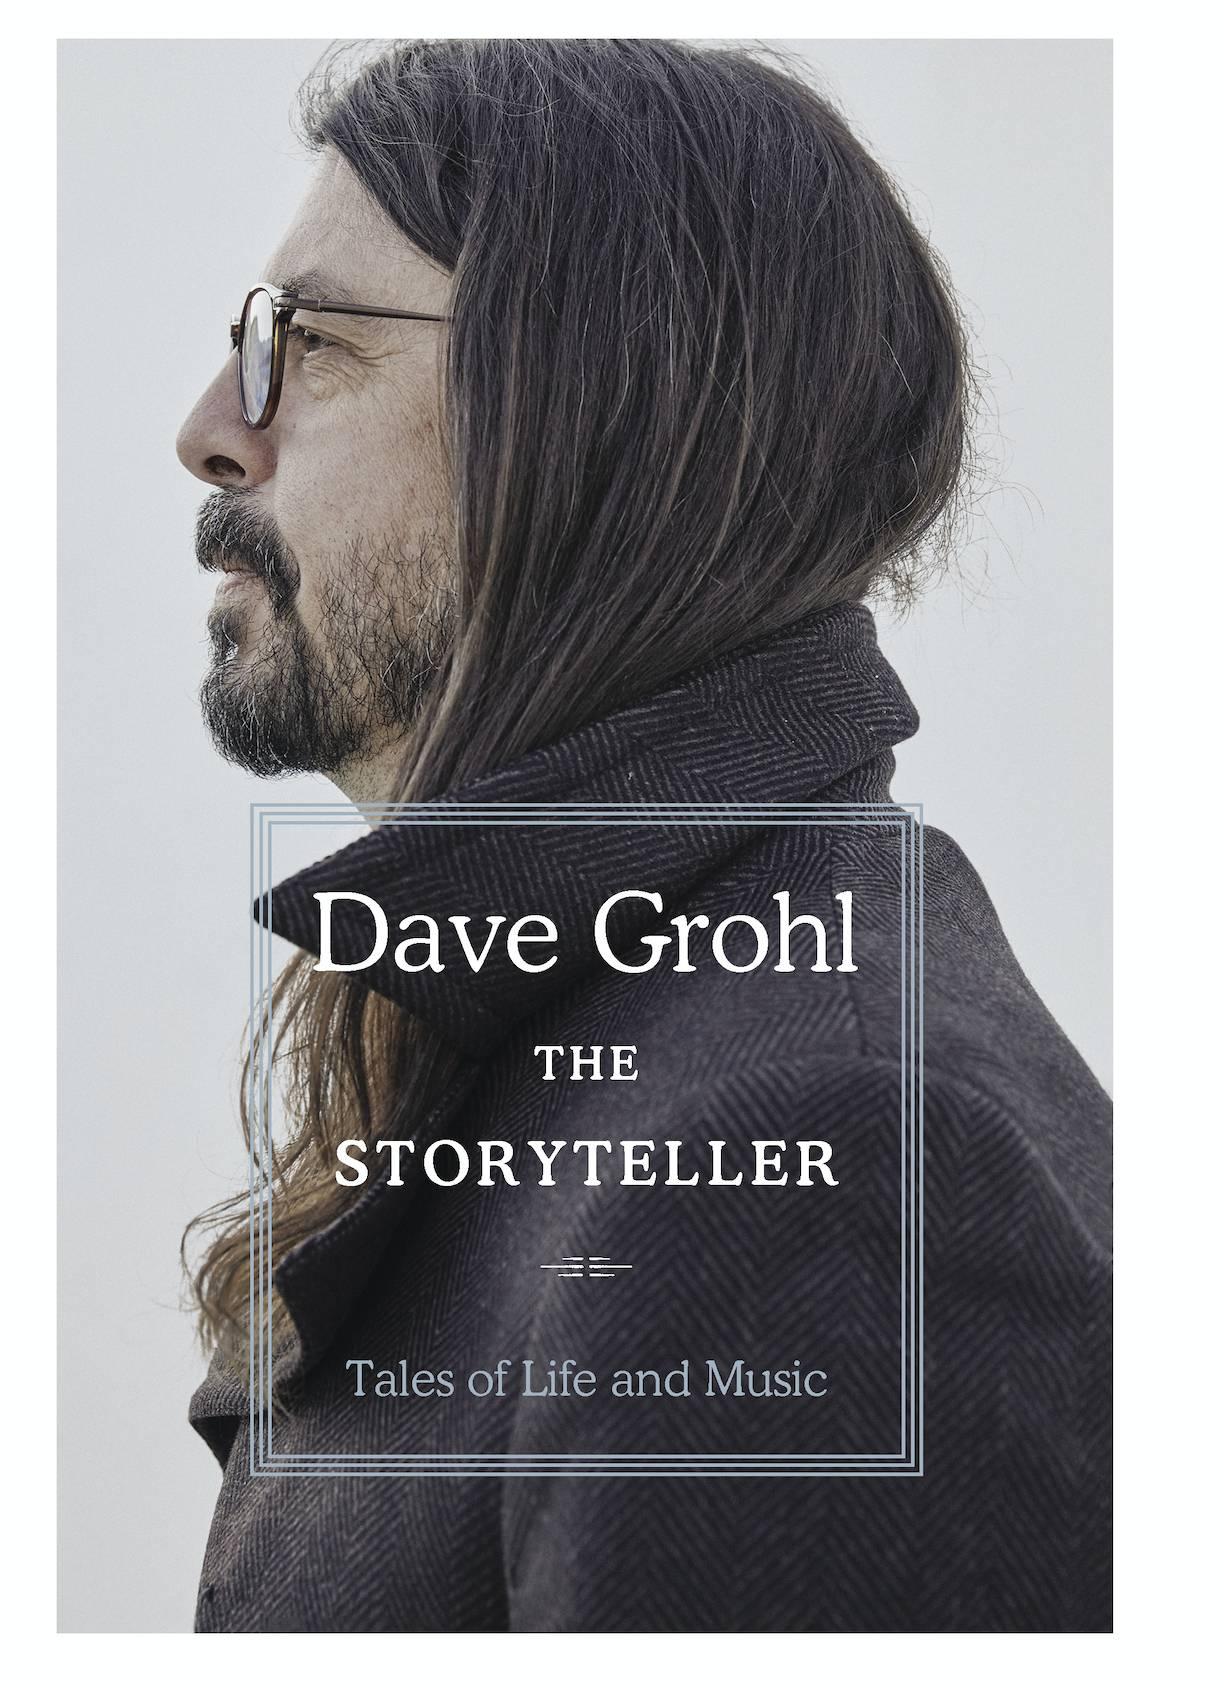 Dave Grohl The Storyteller